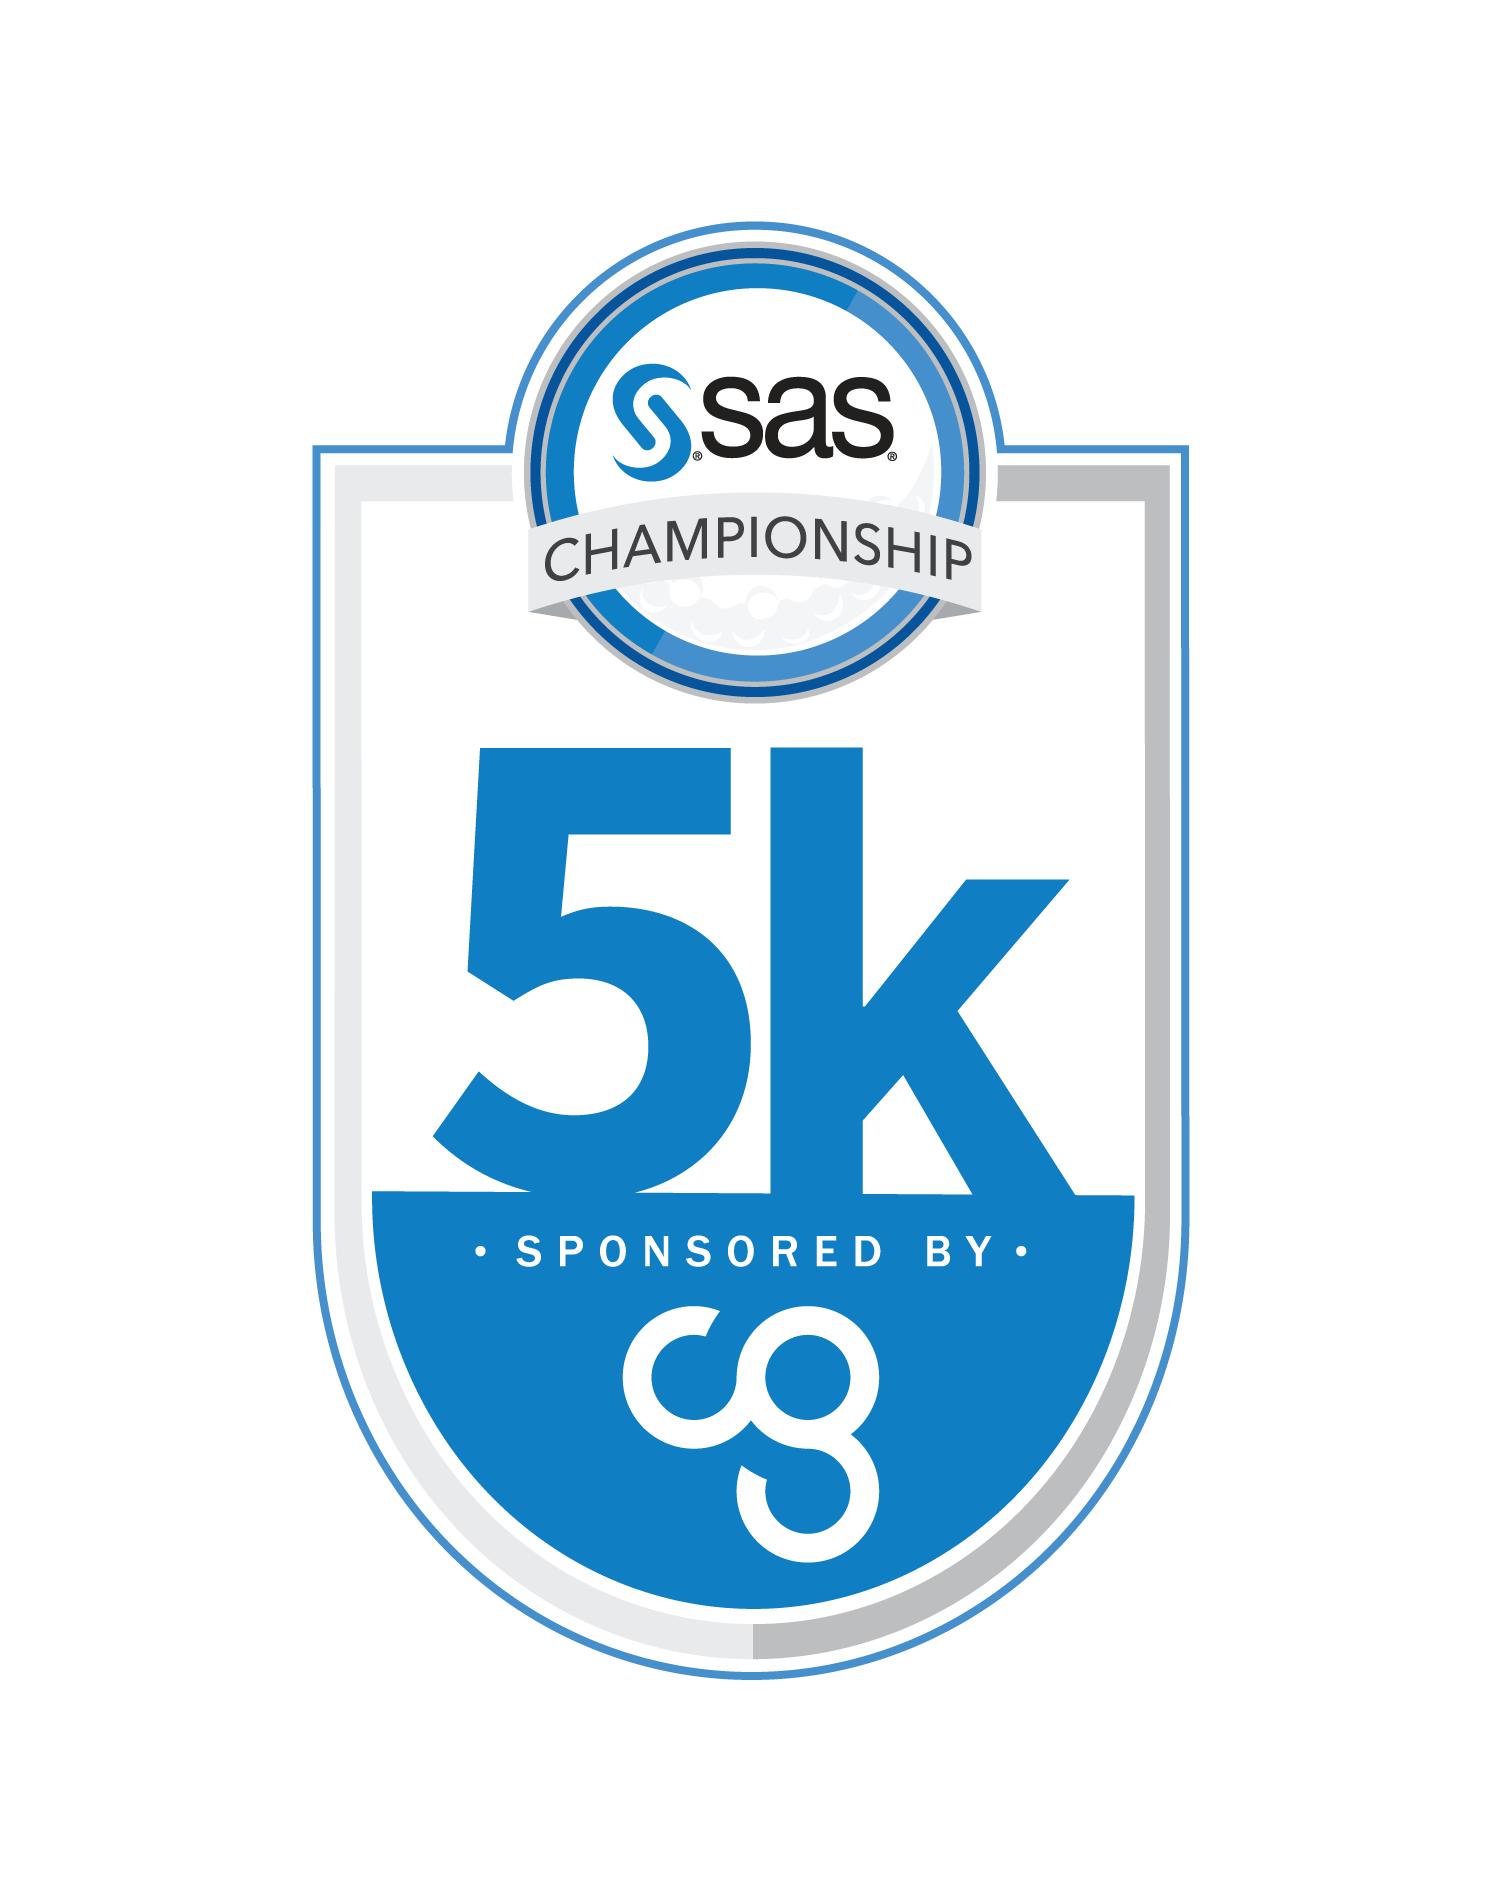 SAS Championship 5K powered by Camp Gladiator